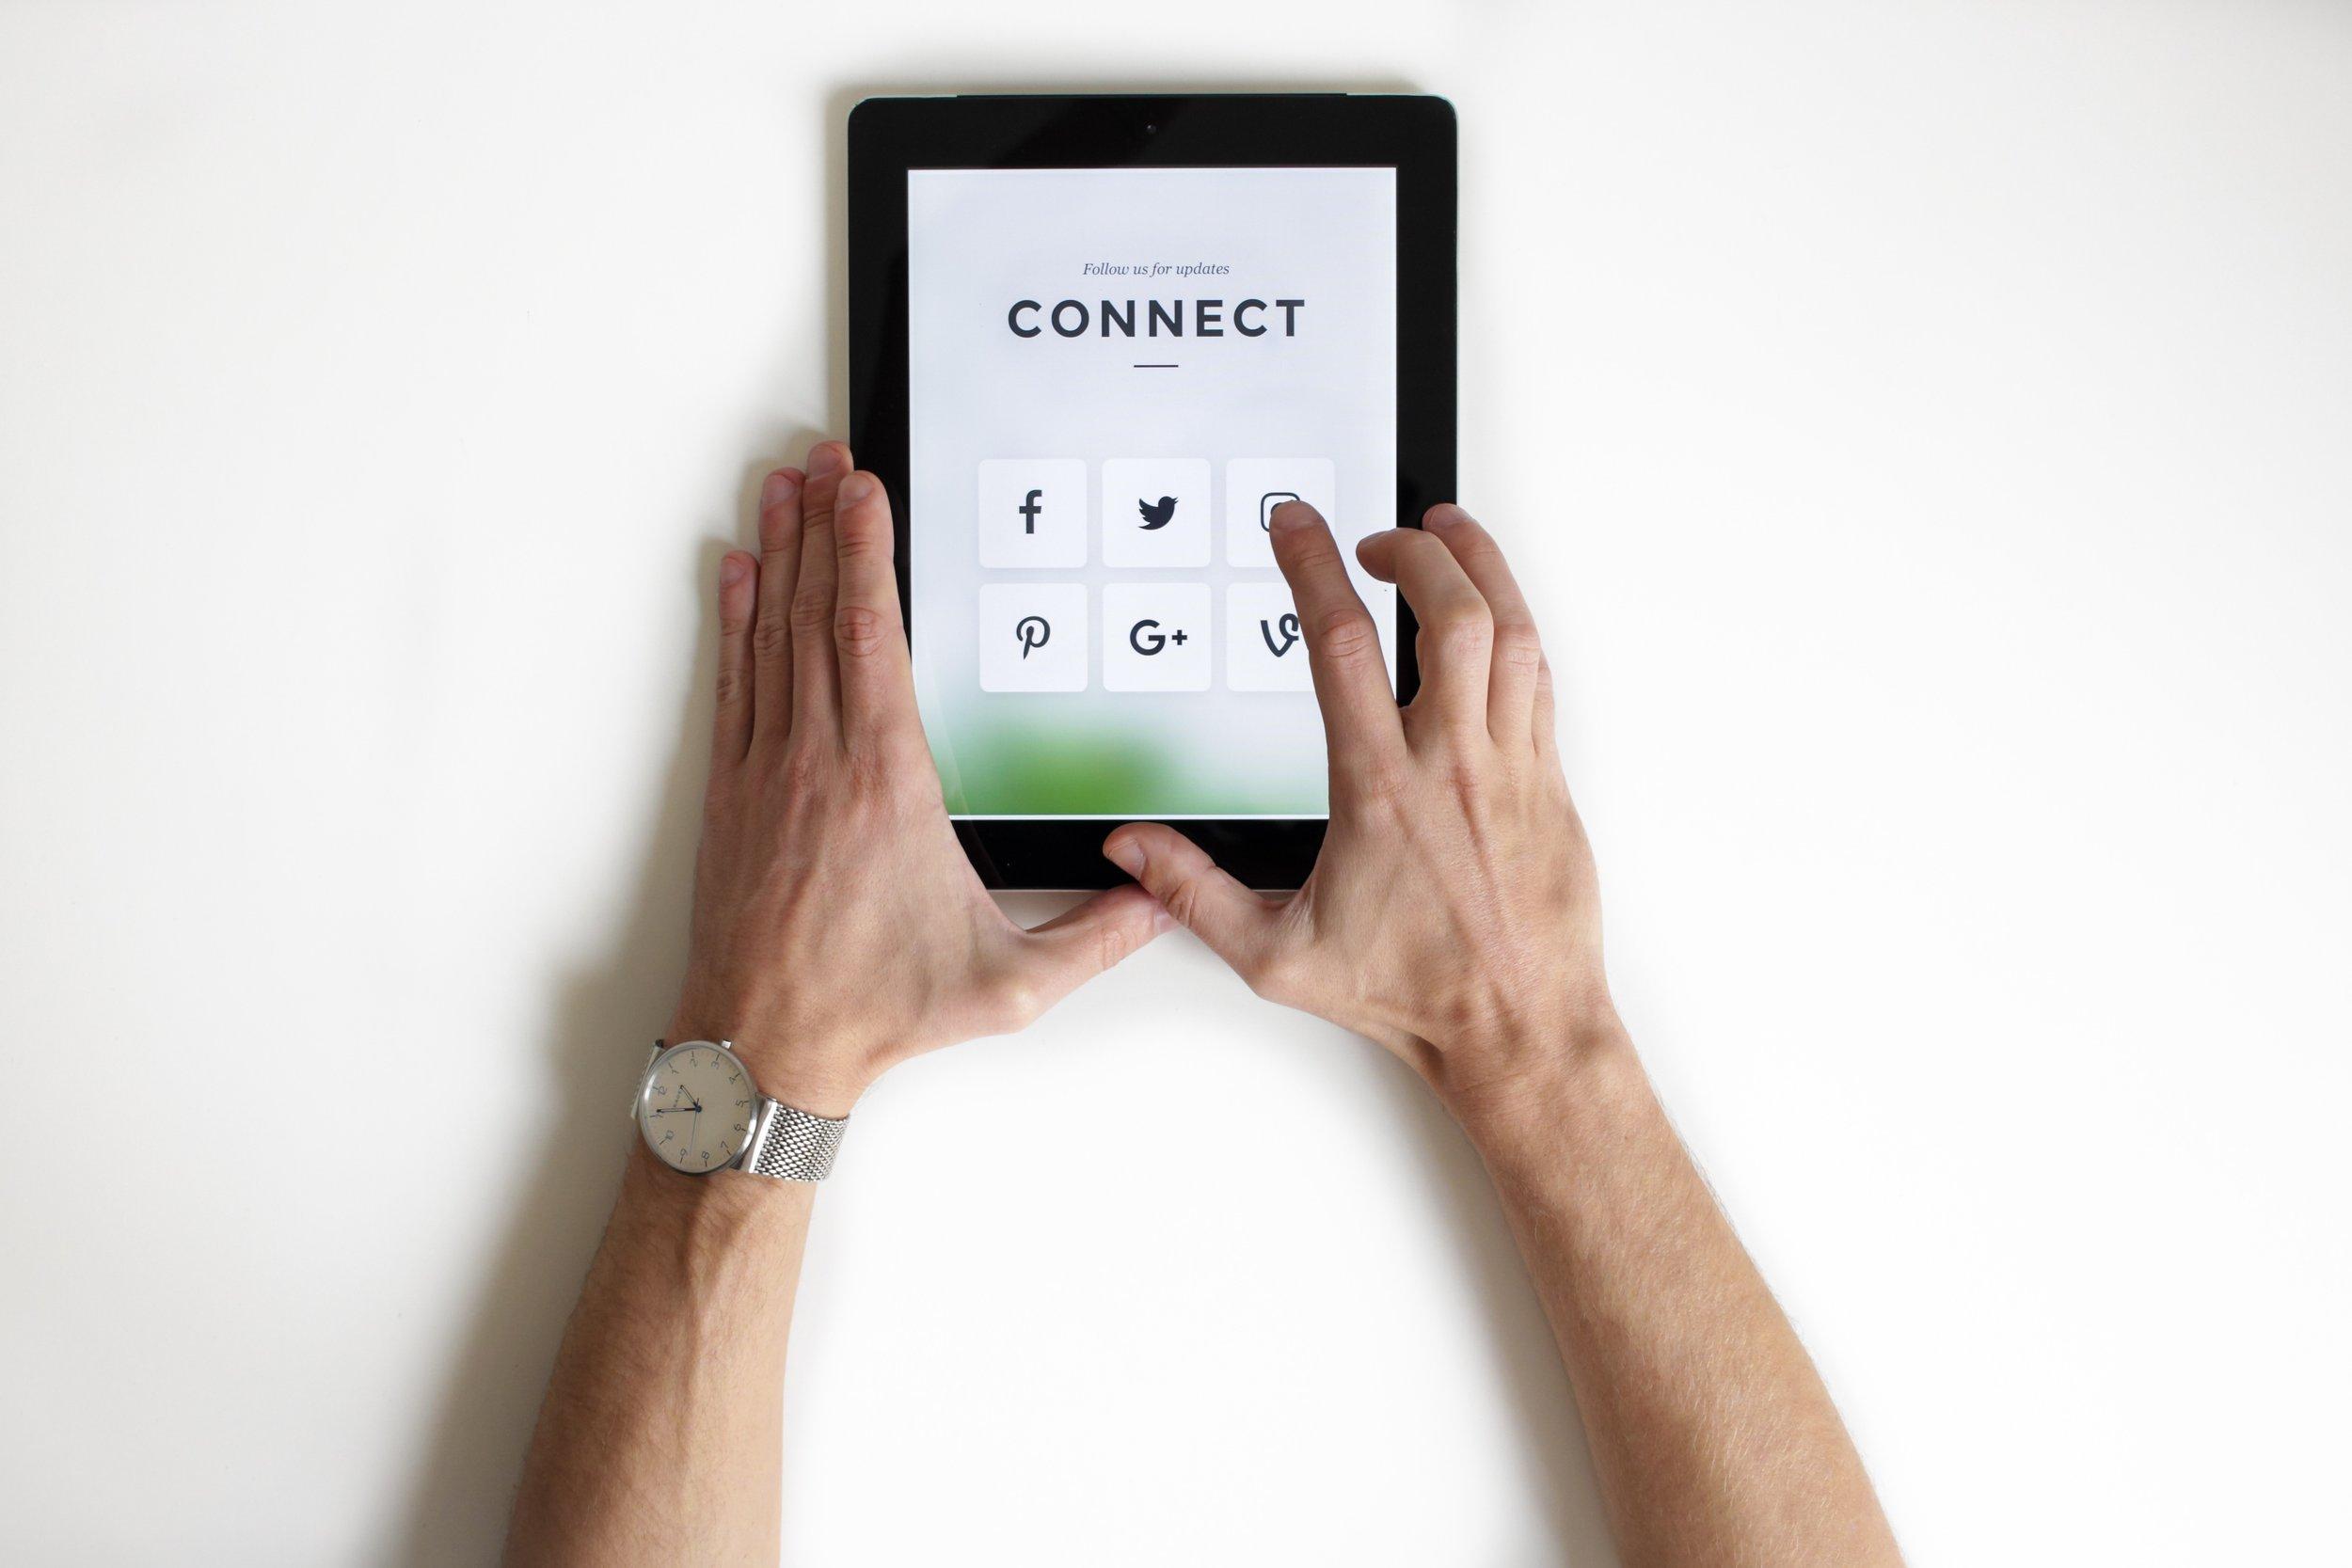 social media and parenting